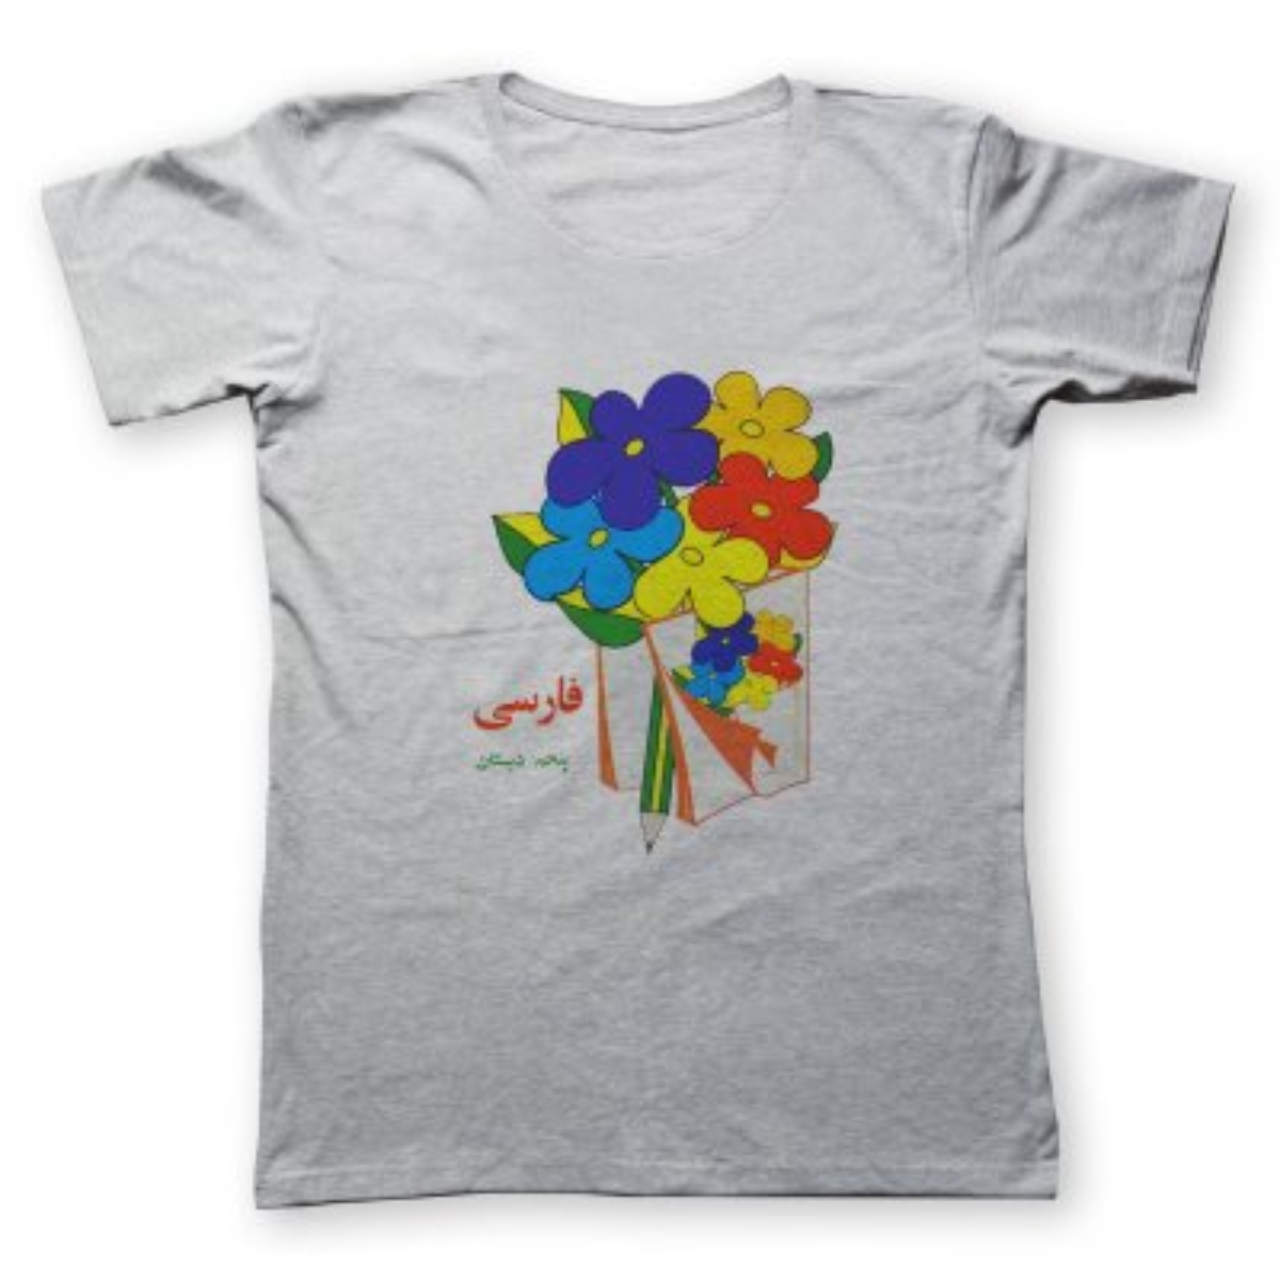 Photo of تی شرت مردانه به رسم طرح کتاب فارسی کد 2212